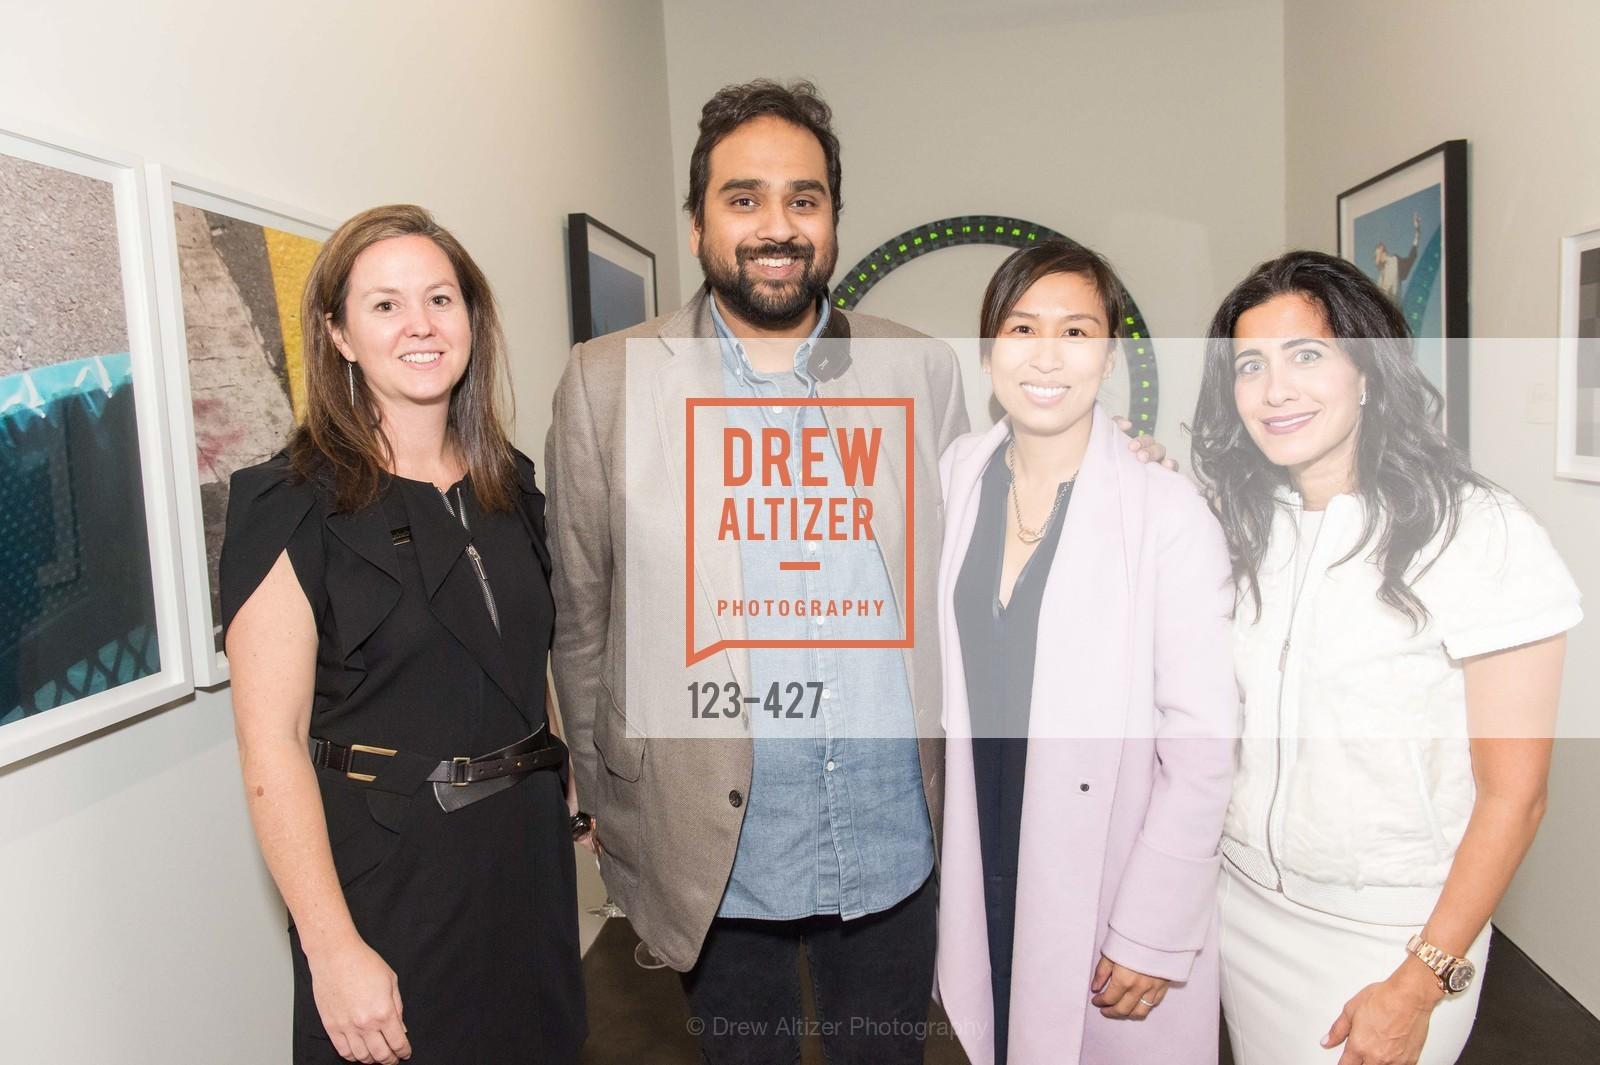 Sarah Shepard, Hosain Rahman, Brigette Lau, Aileen Agopian, Artsy and Sotheby's Dinner at Fused, Fused, October 29th, 2015